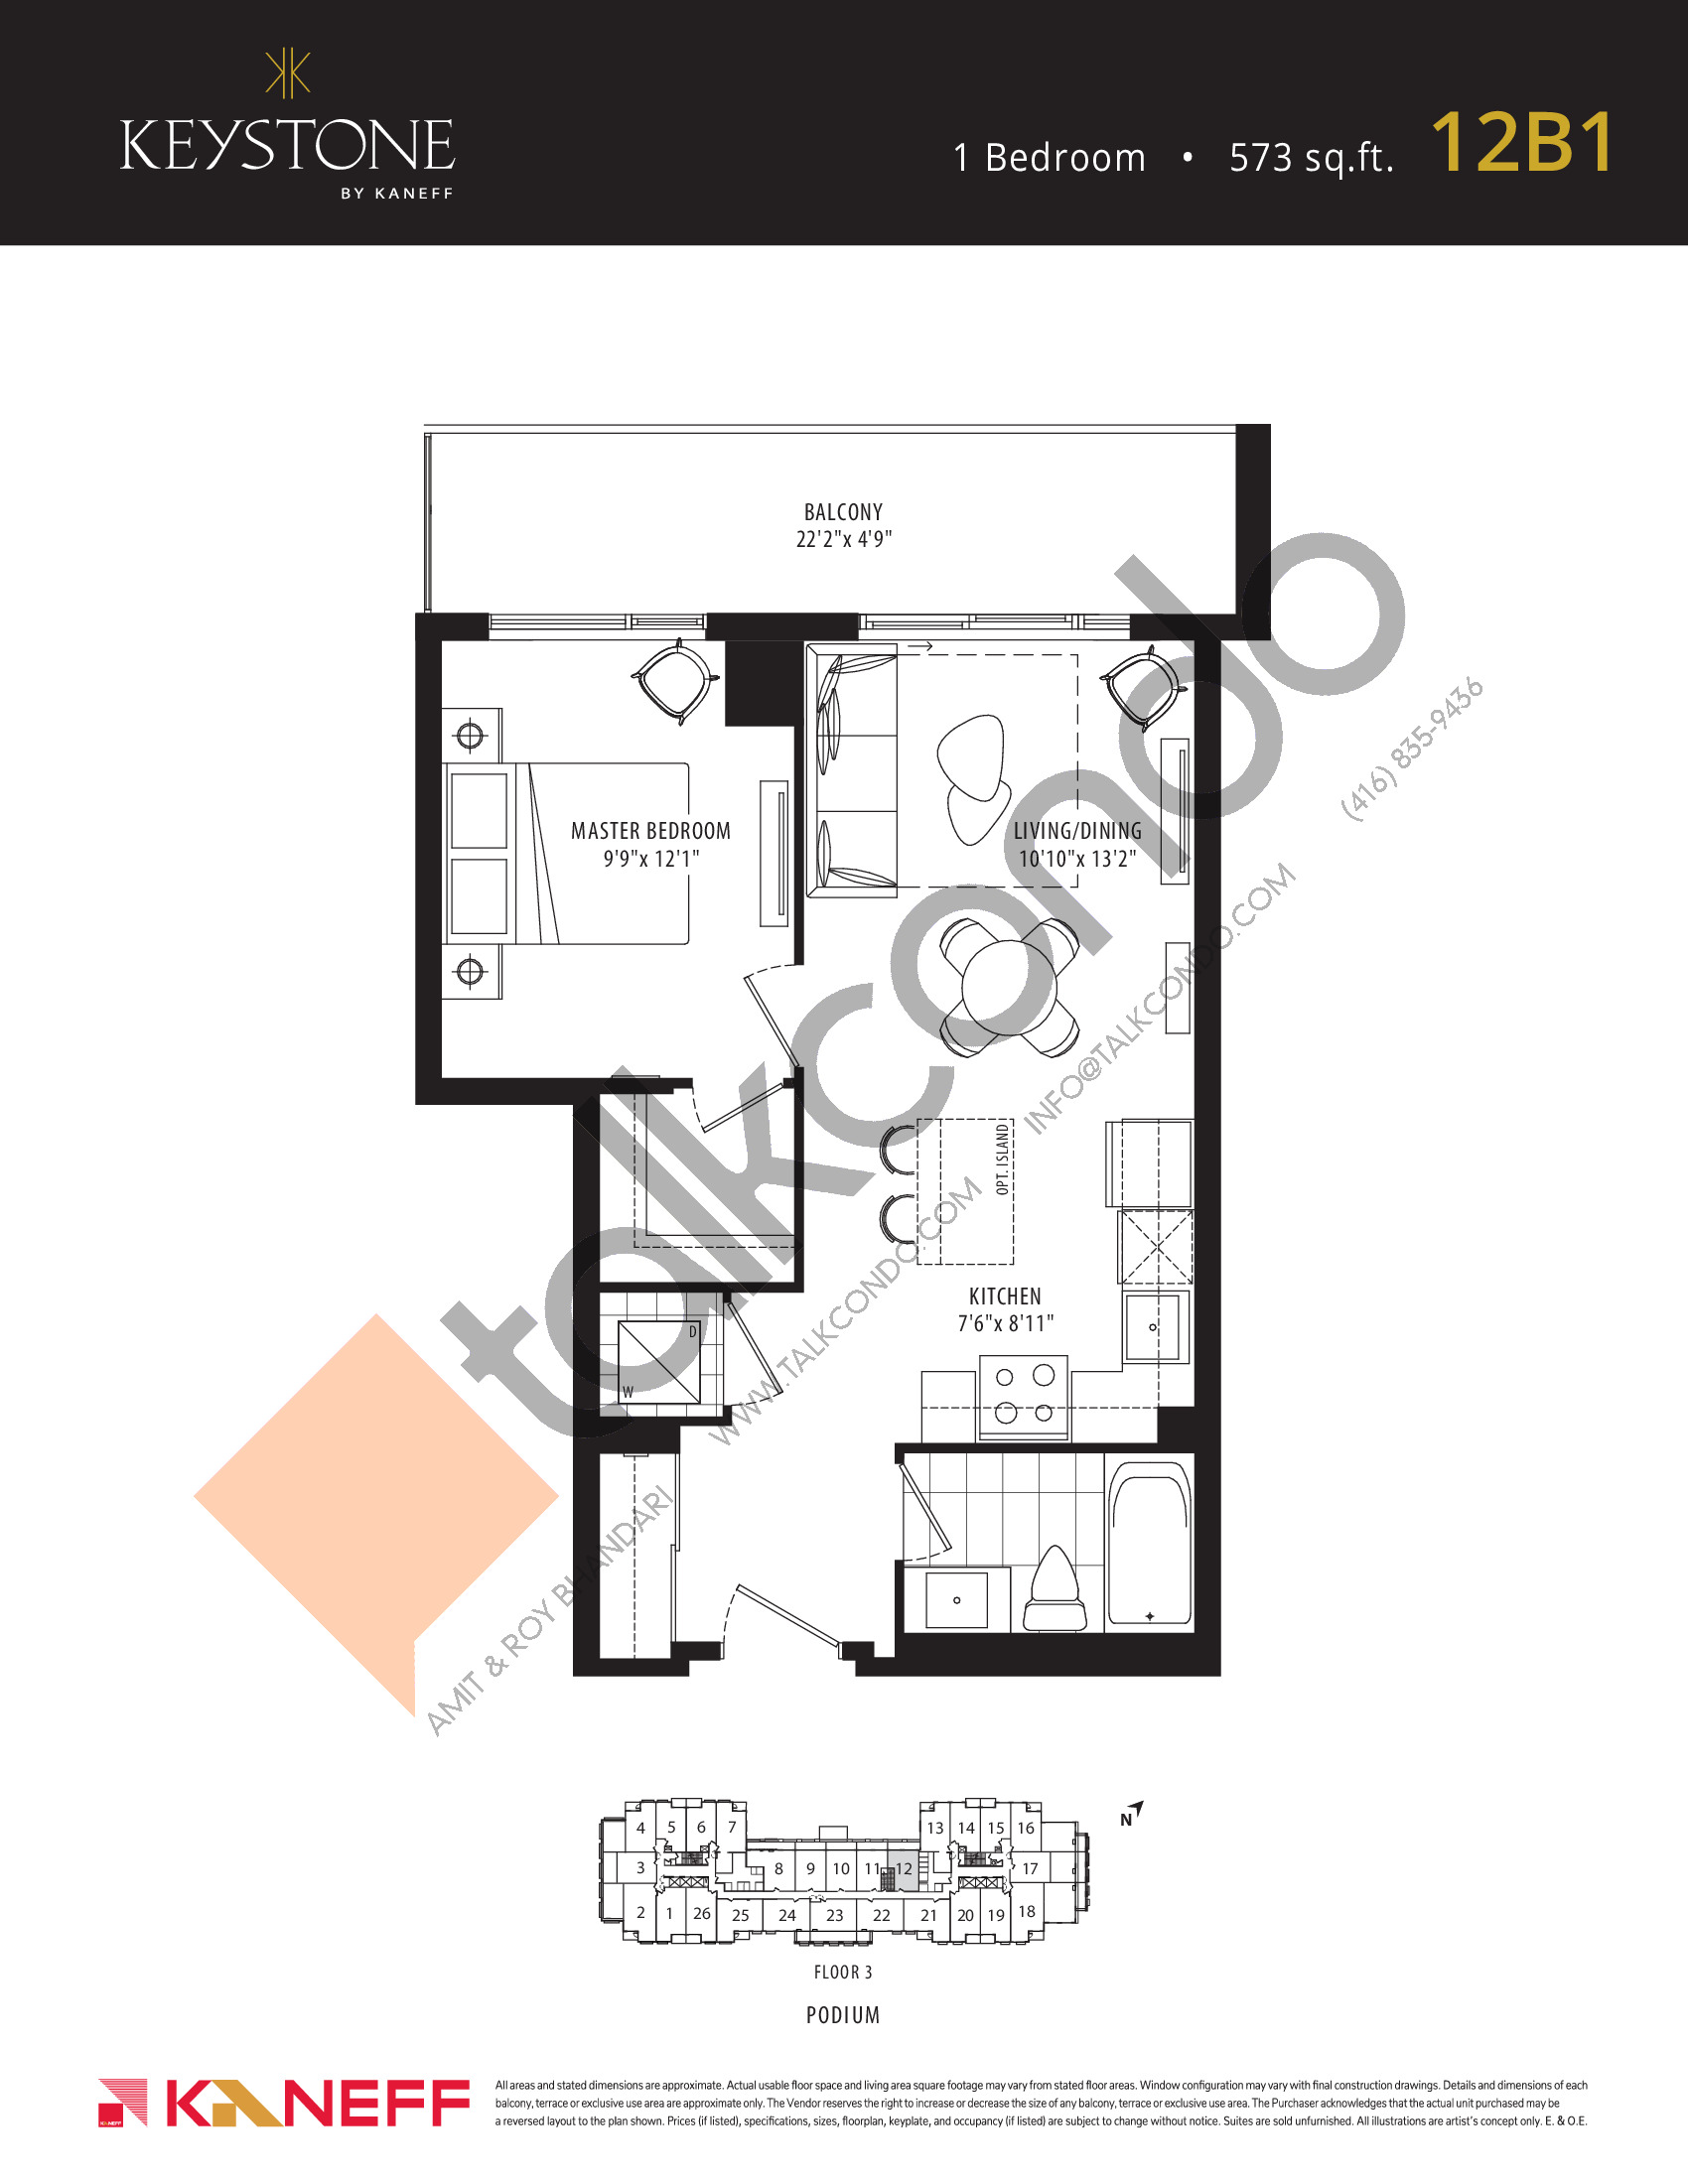 12B1 Floor Plan at Keystone Condos Phase 2 - 573 sq.ft